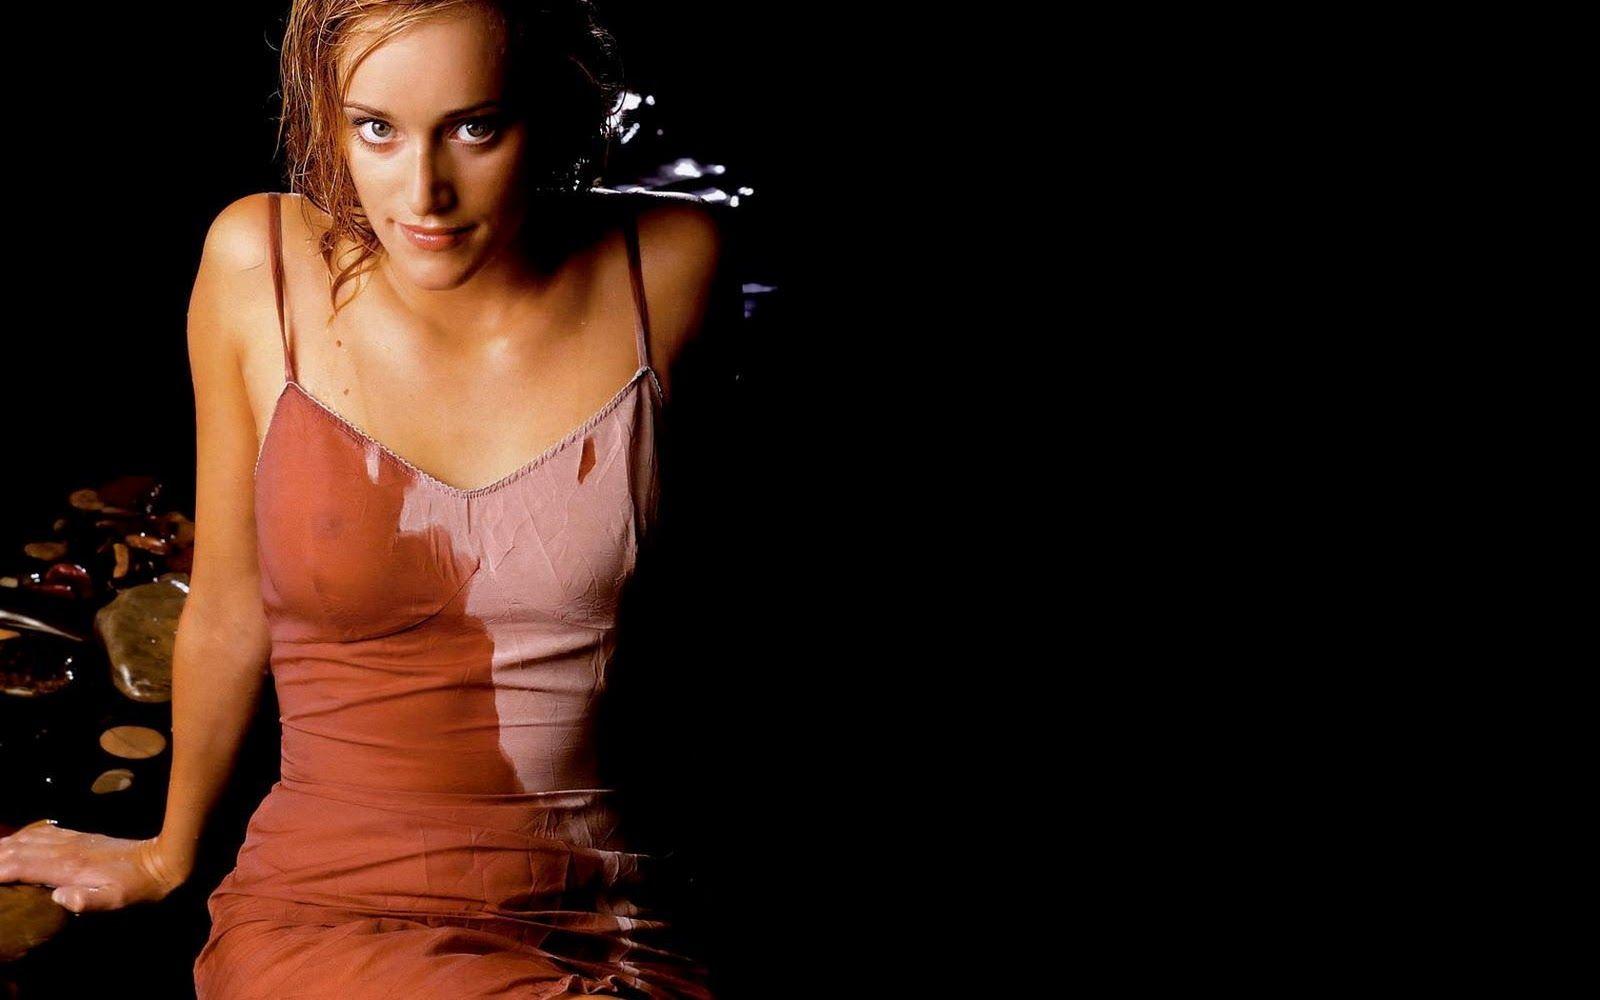 Judith Richter Nude judith richter, tv actress | actresses, celebrities, celebs